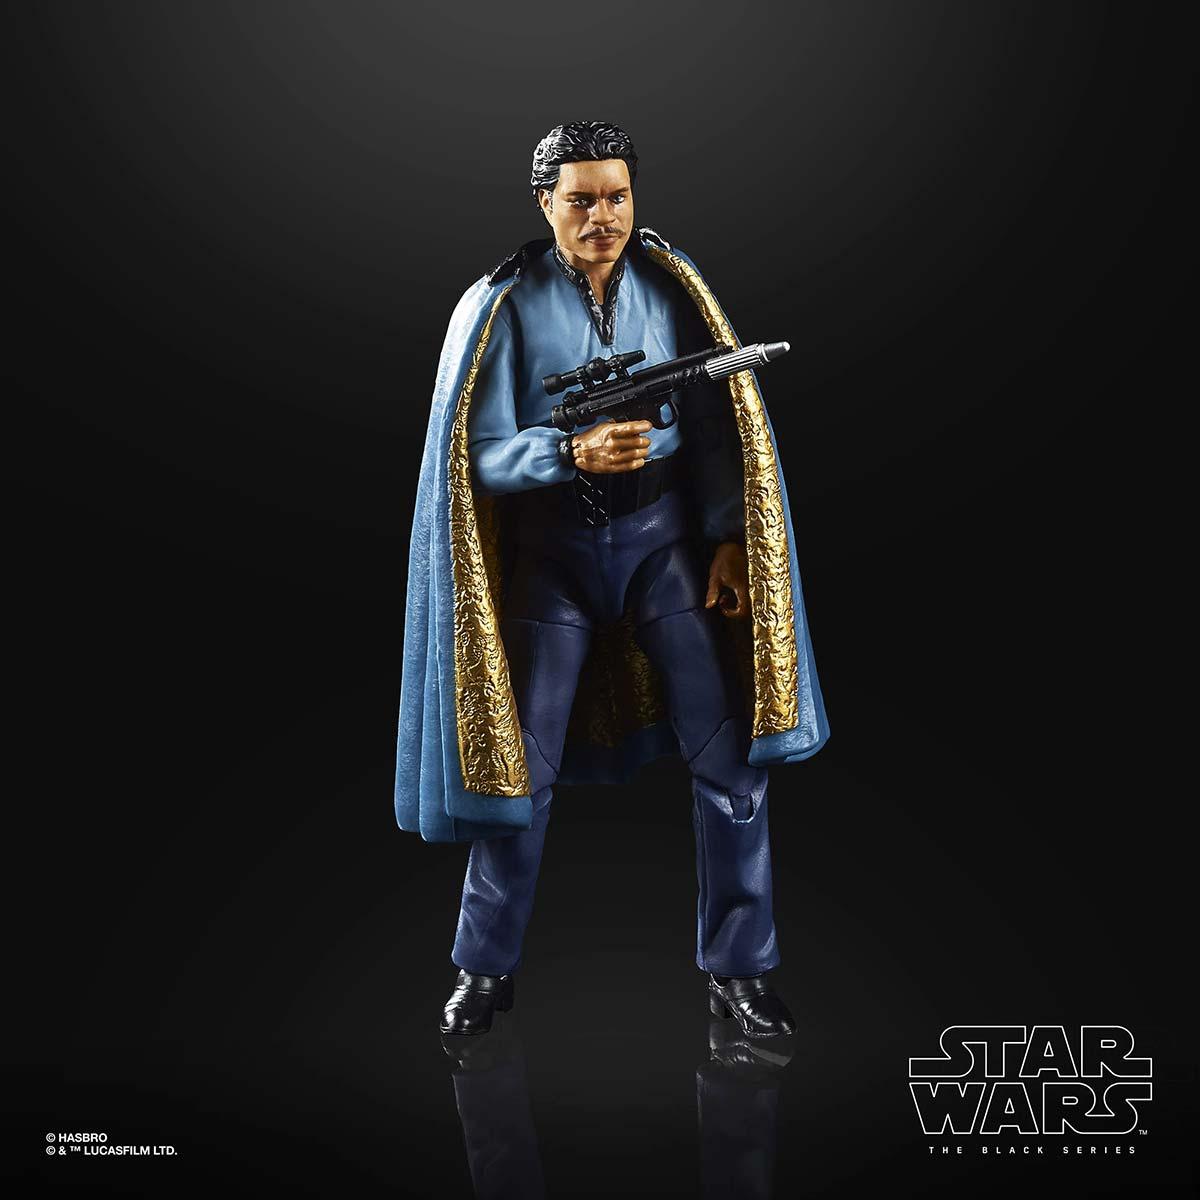 Hasbro Star Wars The Black Series Lando Calrissian Figure